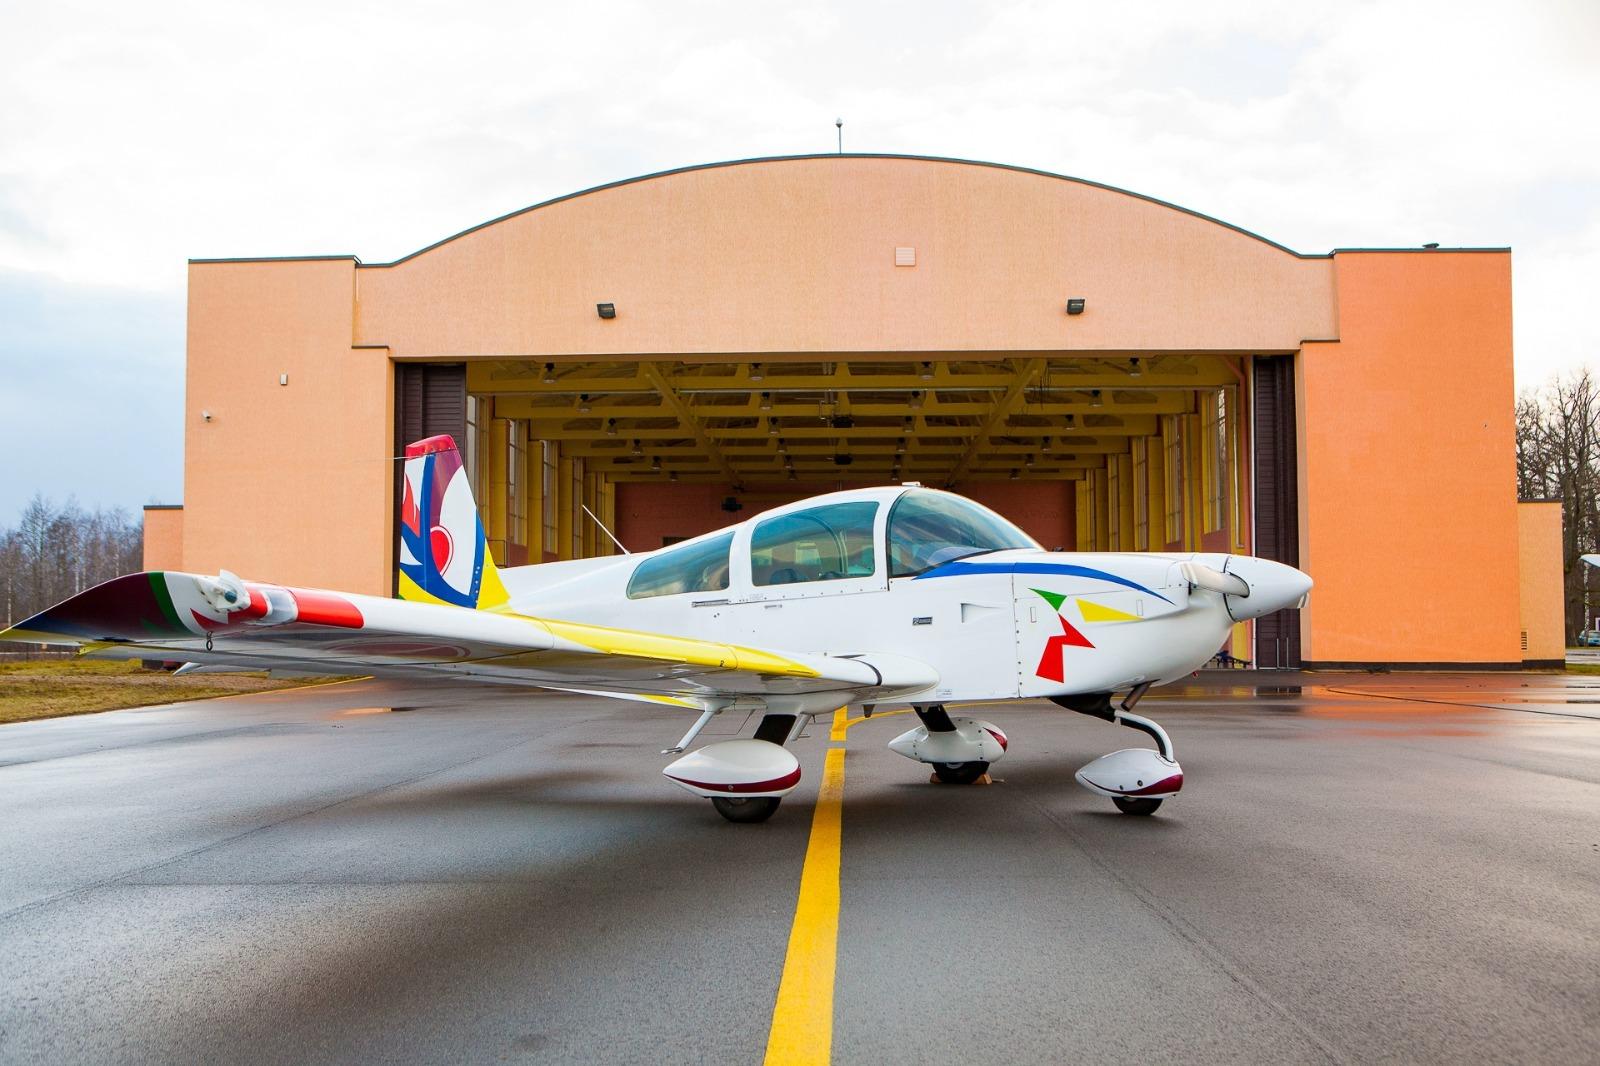 AG-5B Tiger for sale.